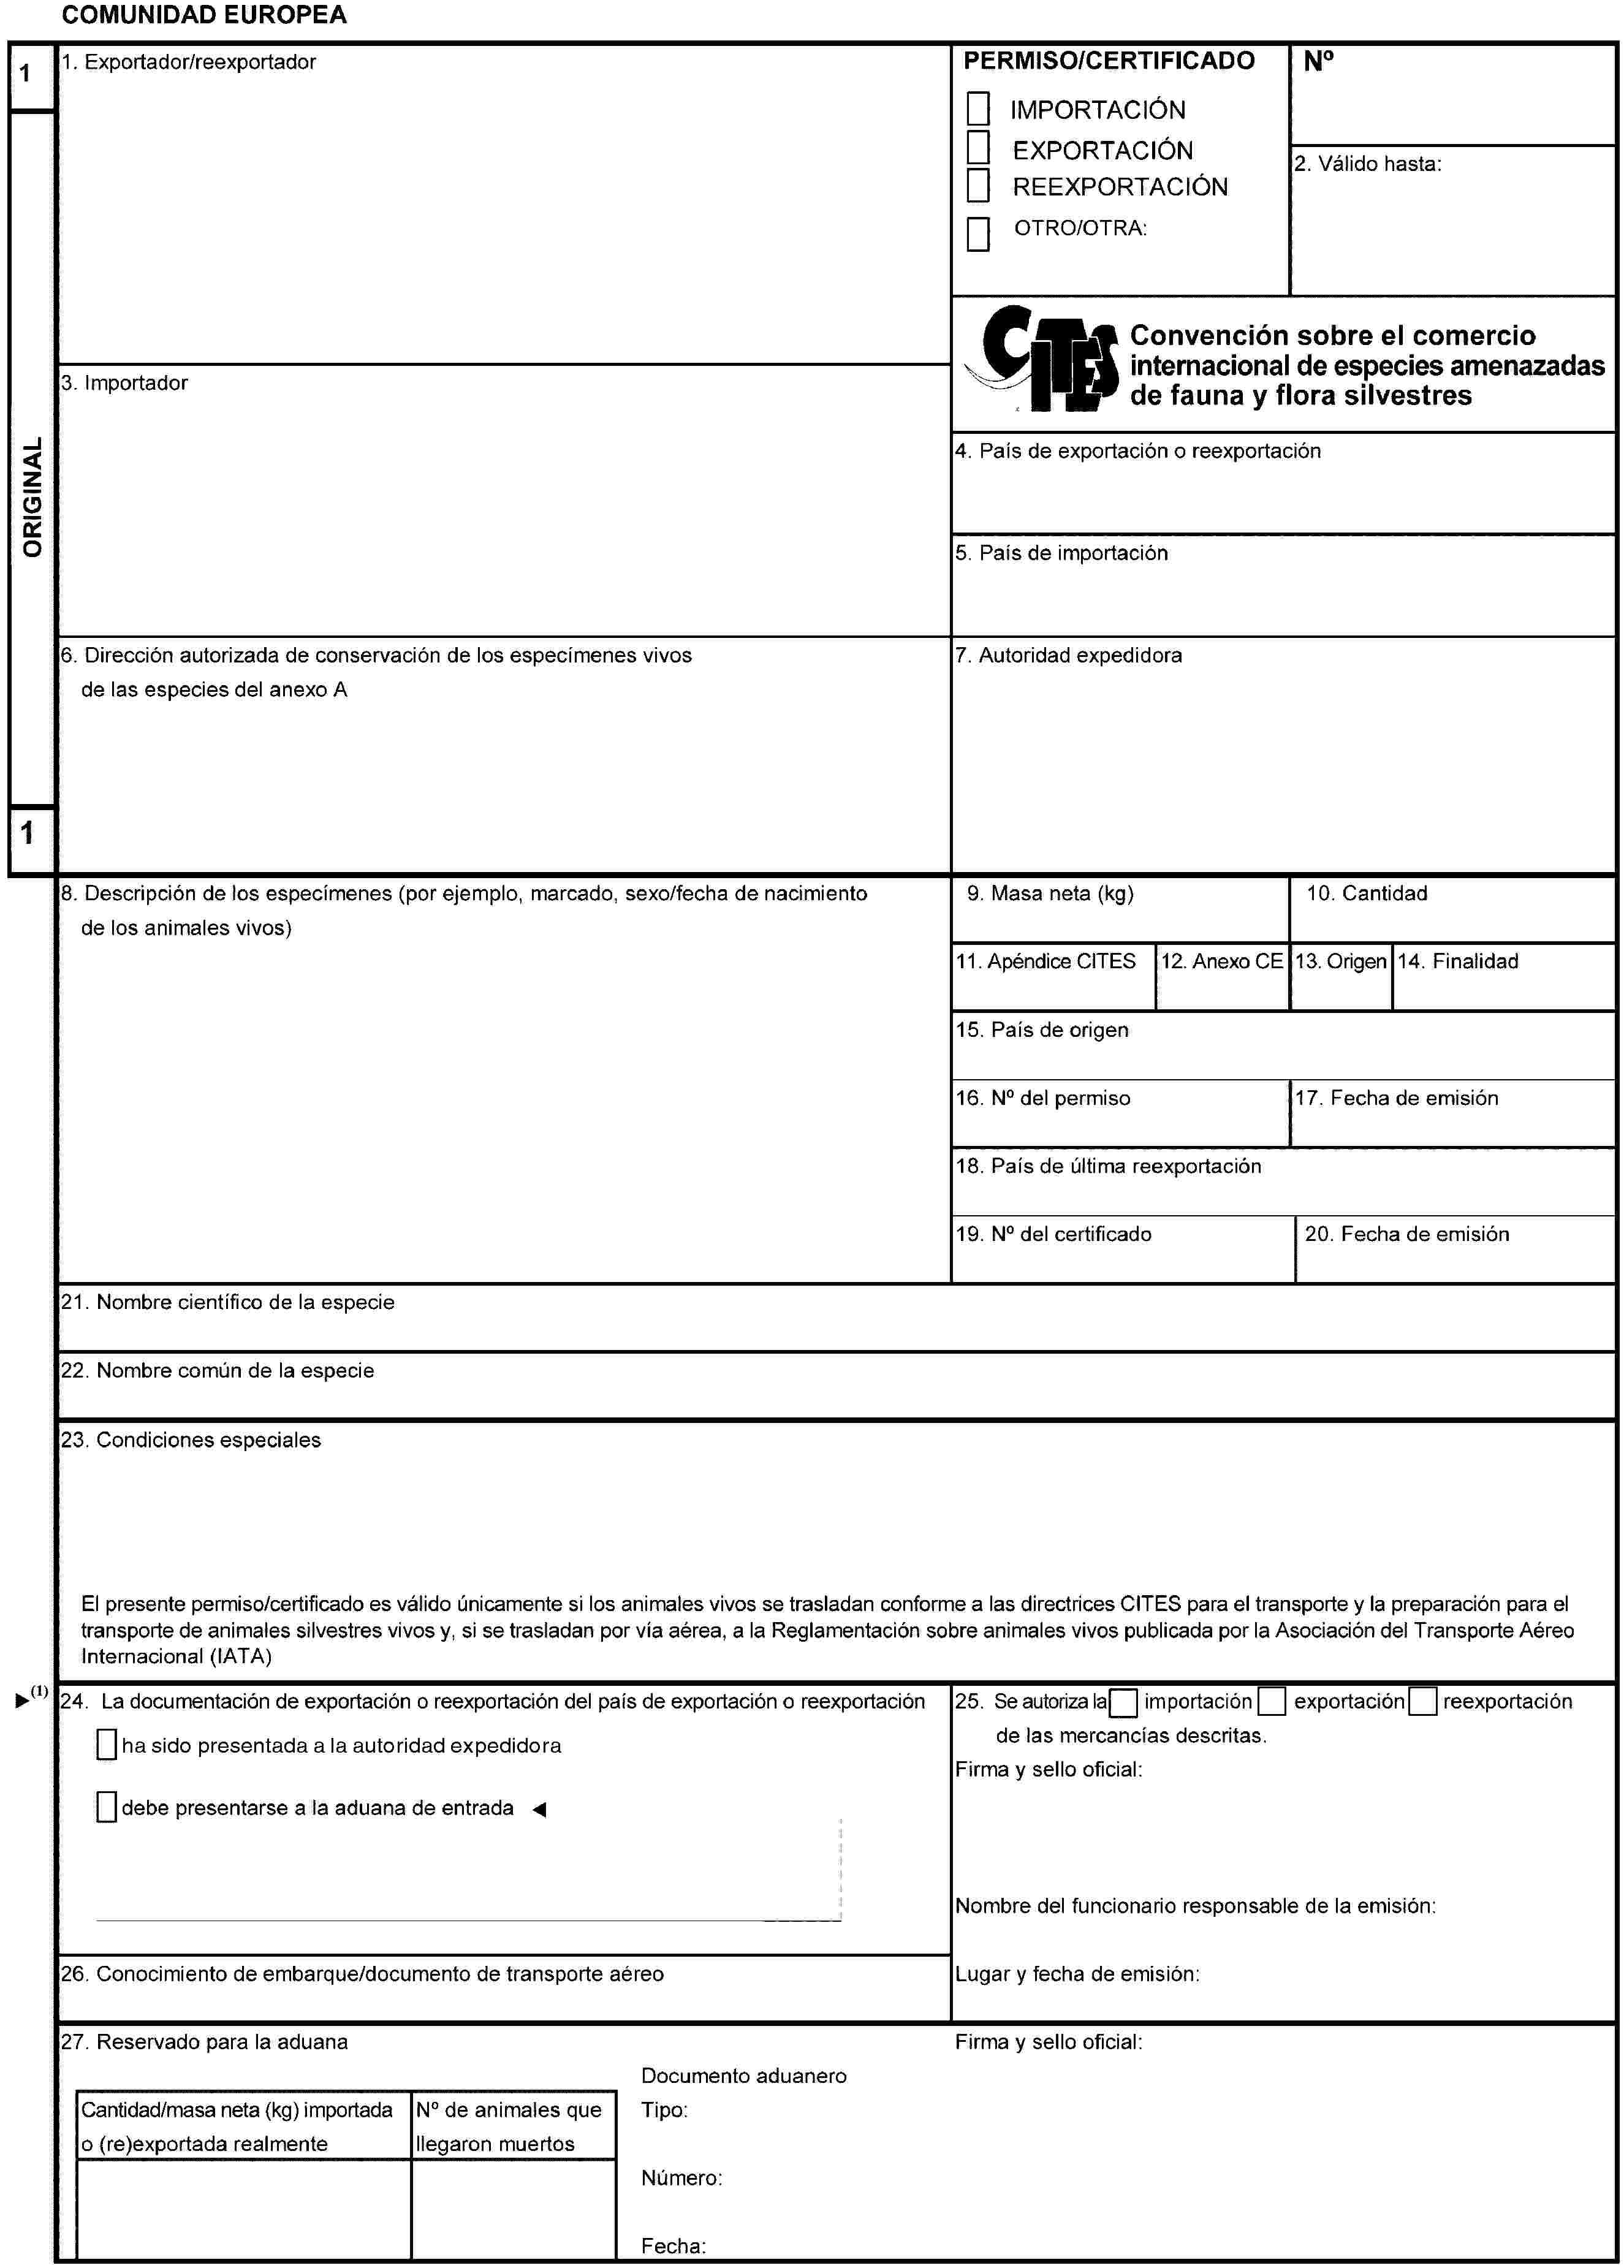 EUR-Lex - 02006R0865-20060709 - EN - EUR-Lex